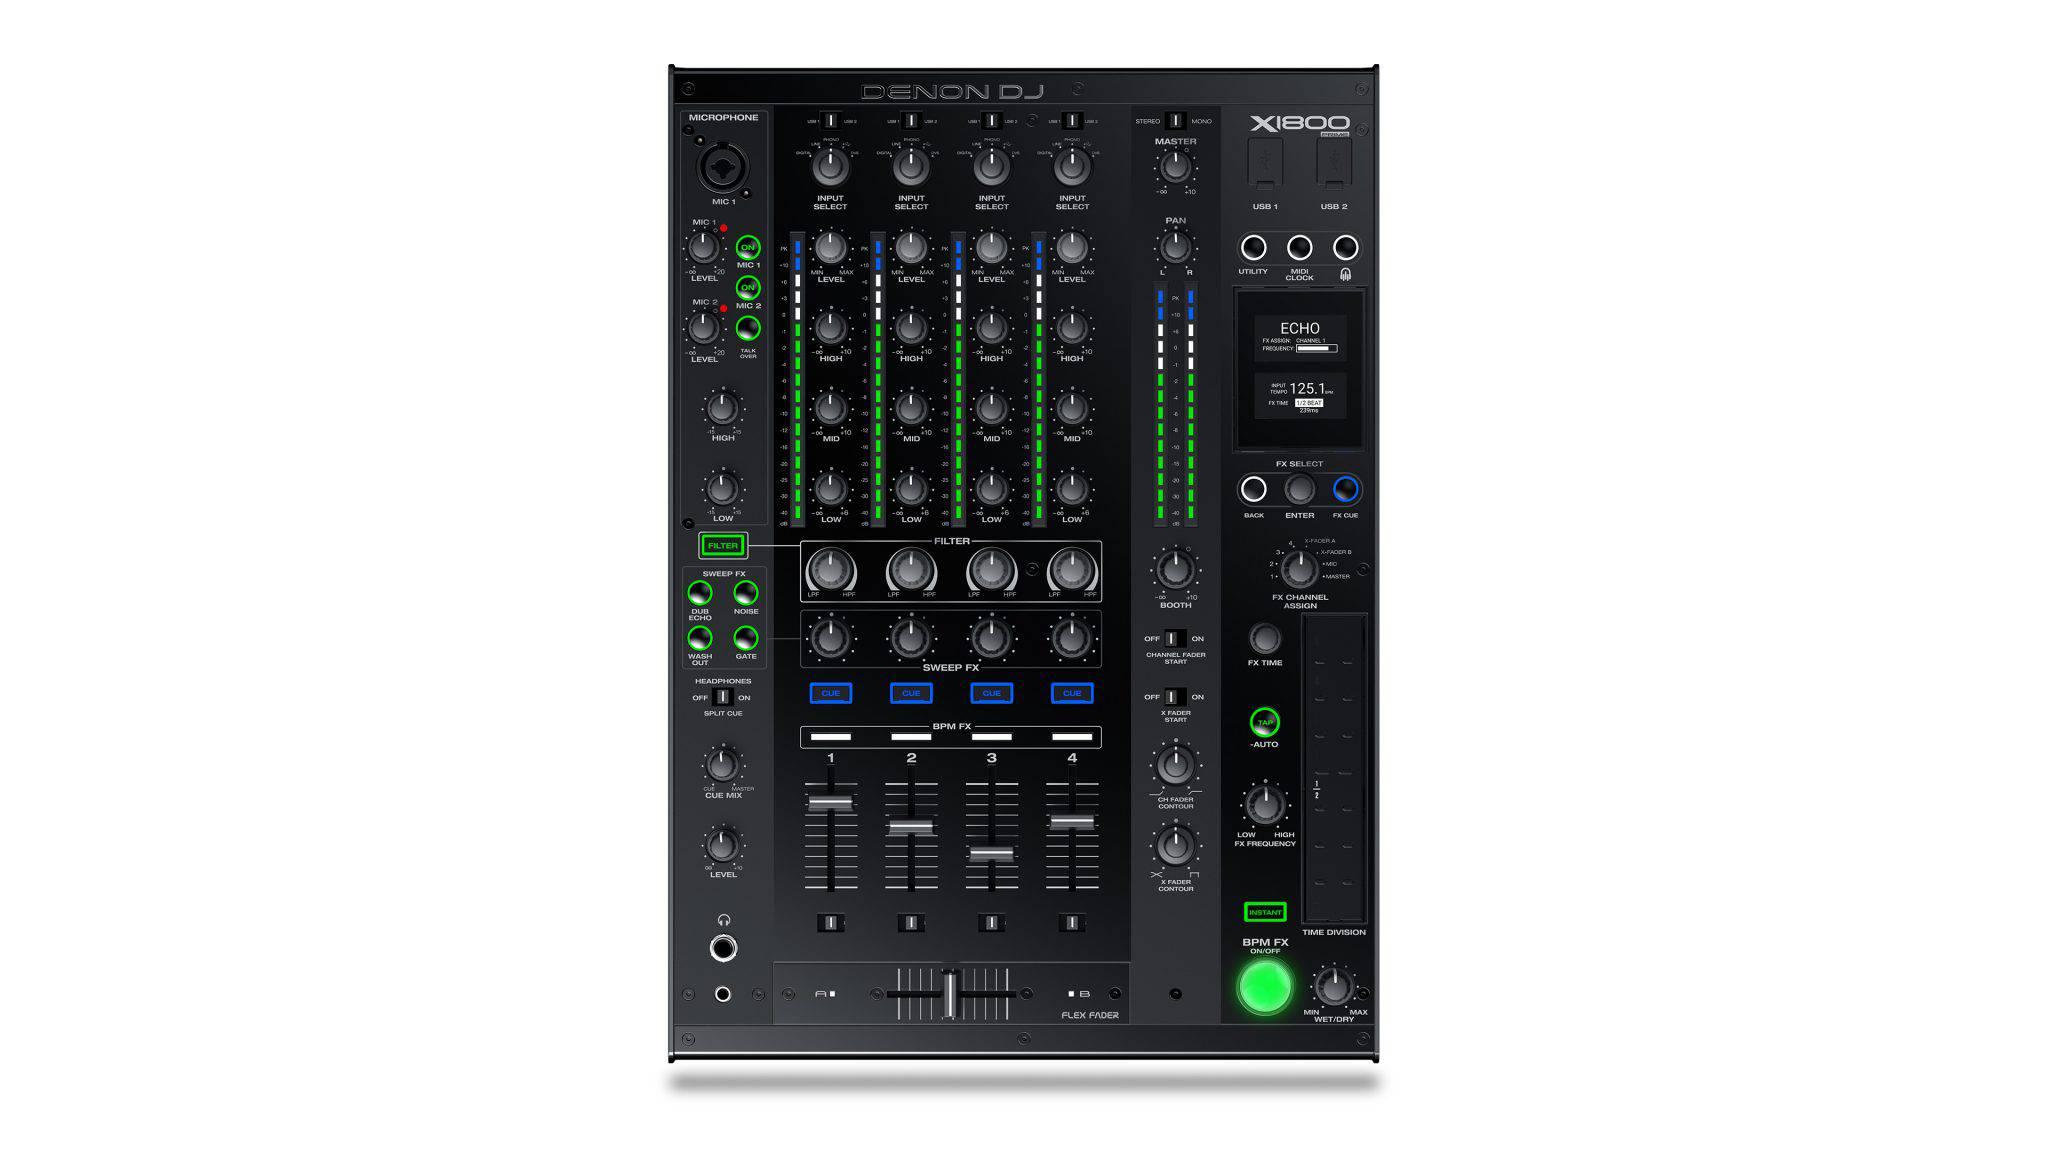 Denon DJ X1800 PRIME - Mixer digital cu 4 canale pentru DJ - vedere ansamblu